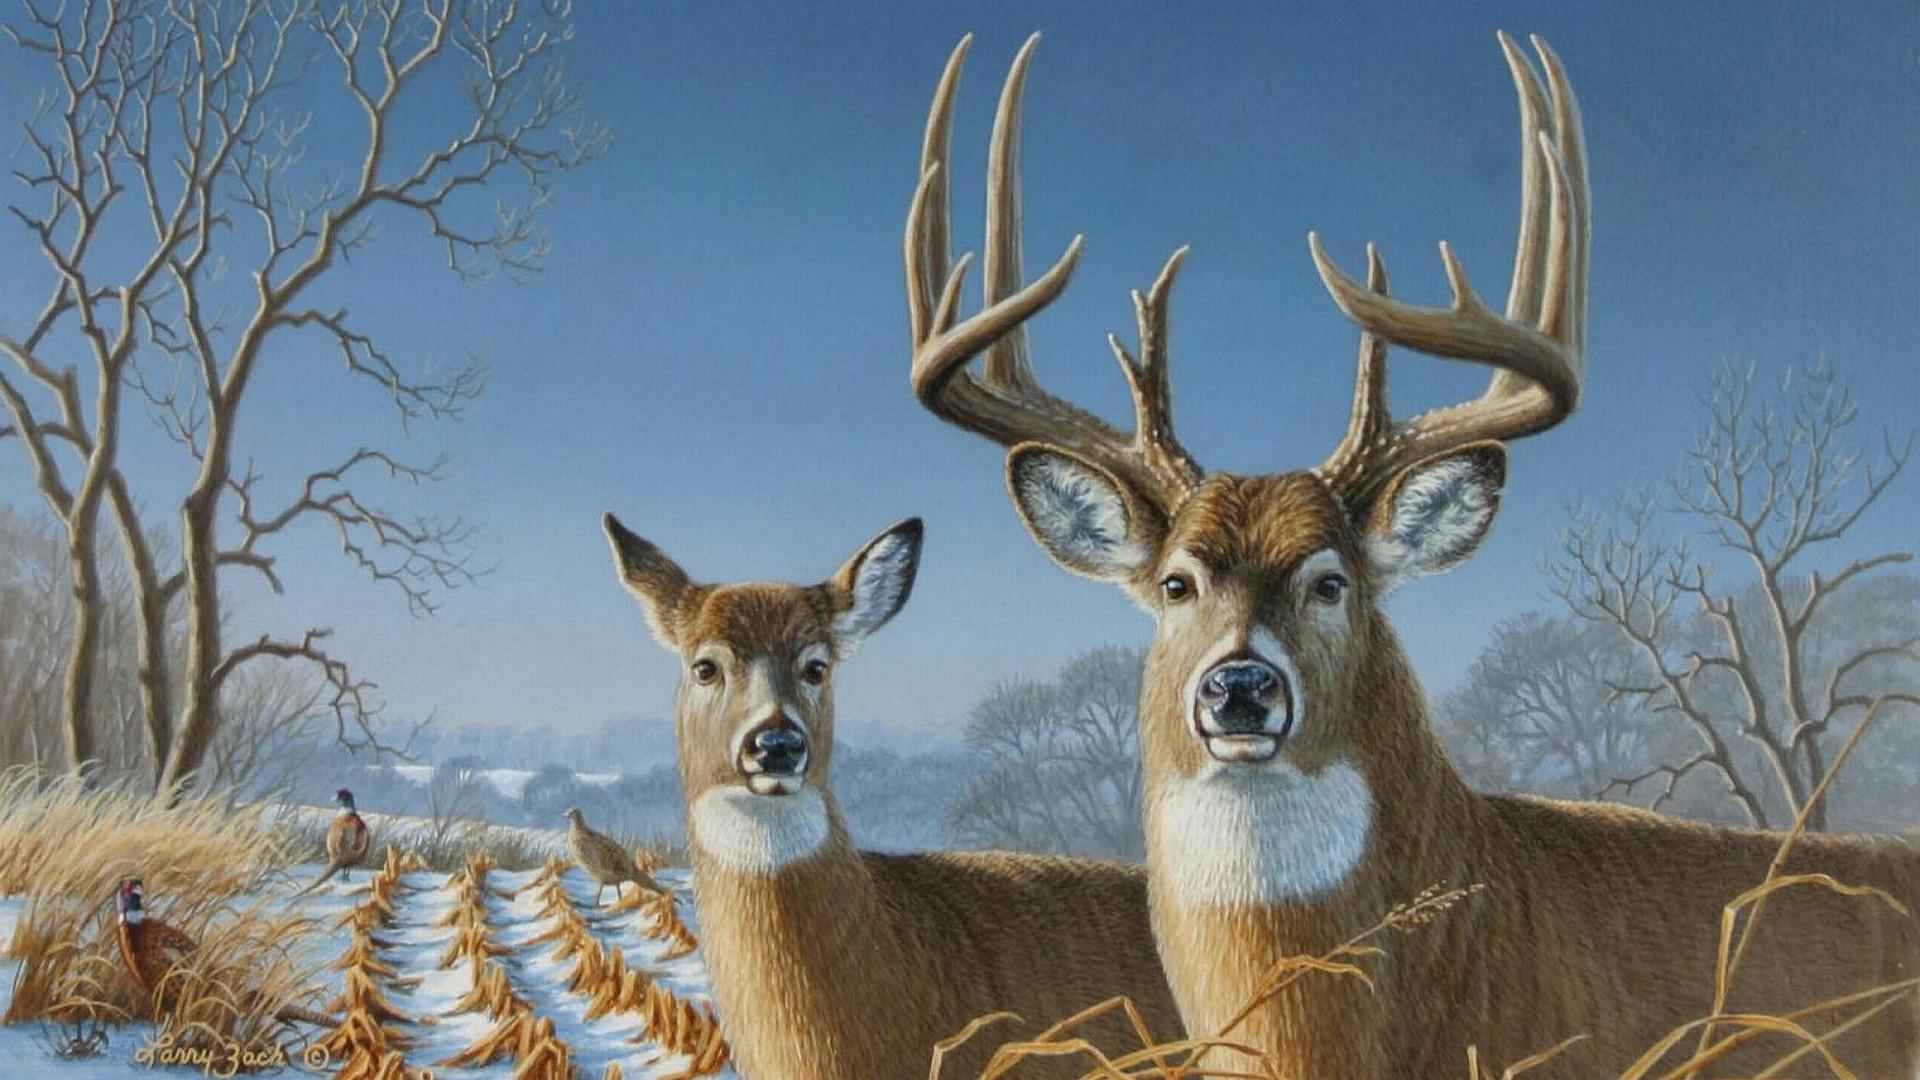 Whitetail Deer Wallpaper Whitetail Deer Backgrounds for PC HD | HD  Wallpapers | Pinterest | Wallpaper and Wallpaper art